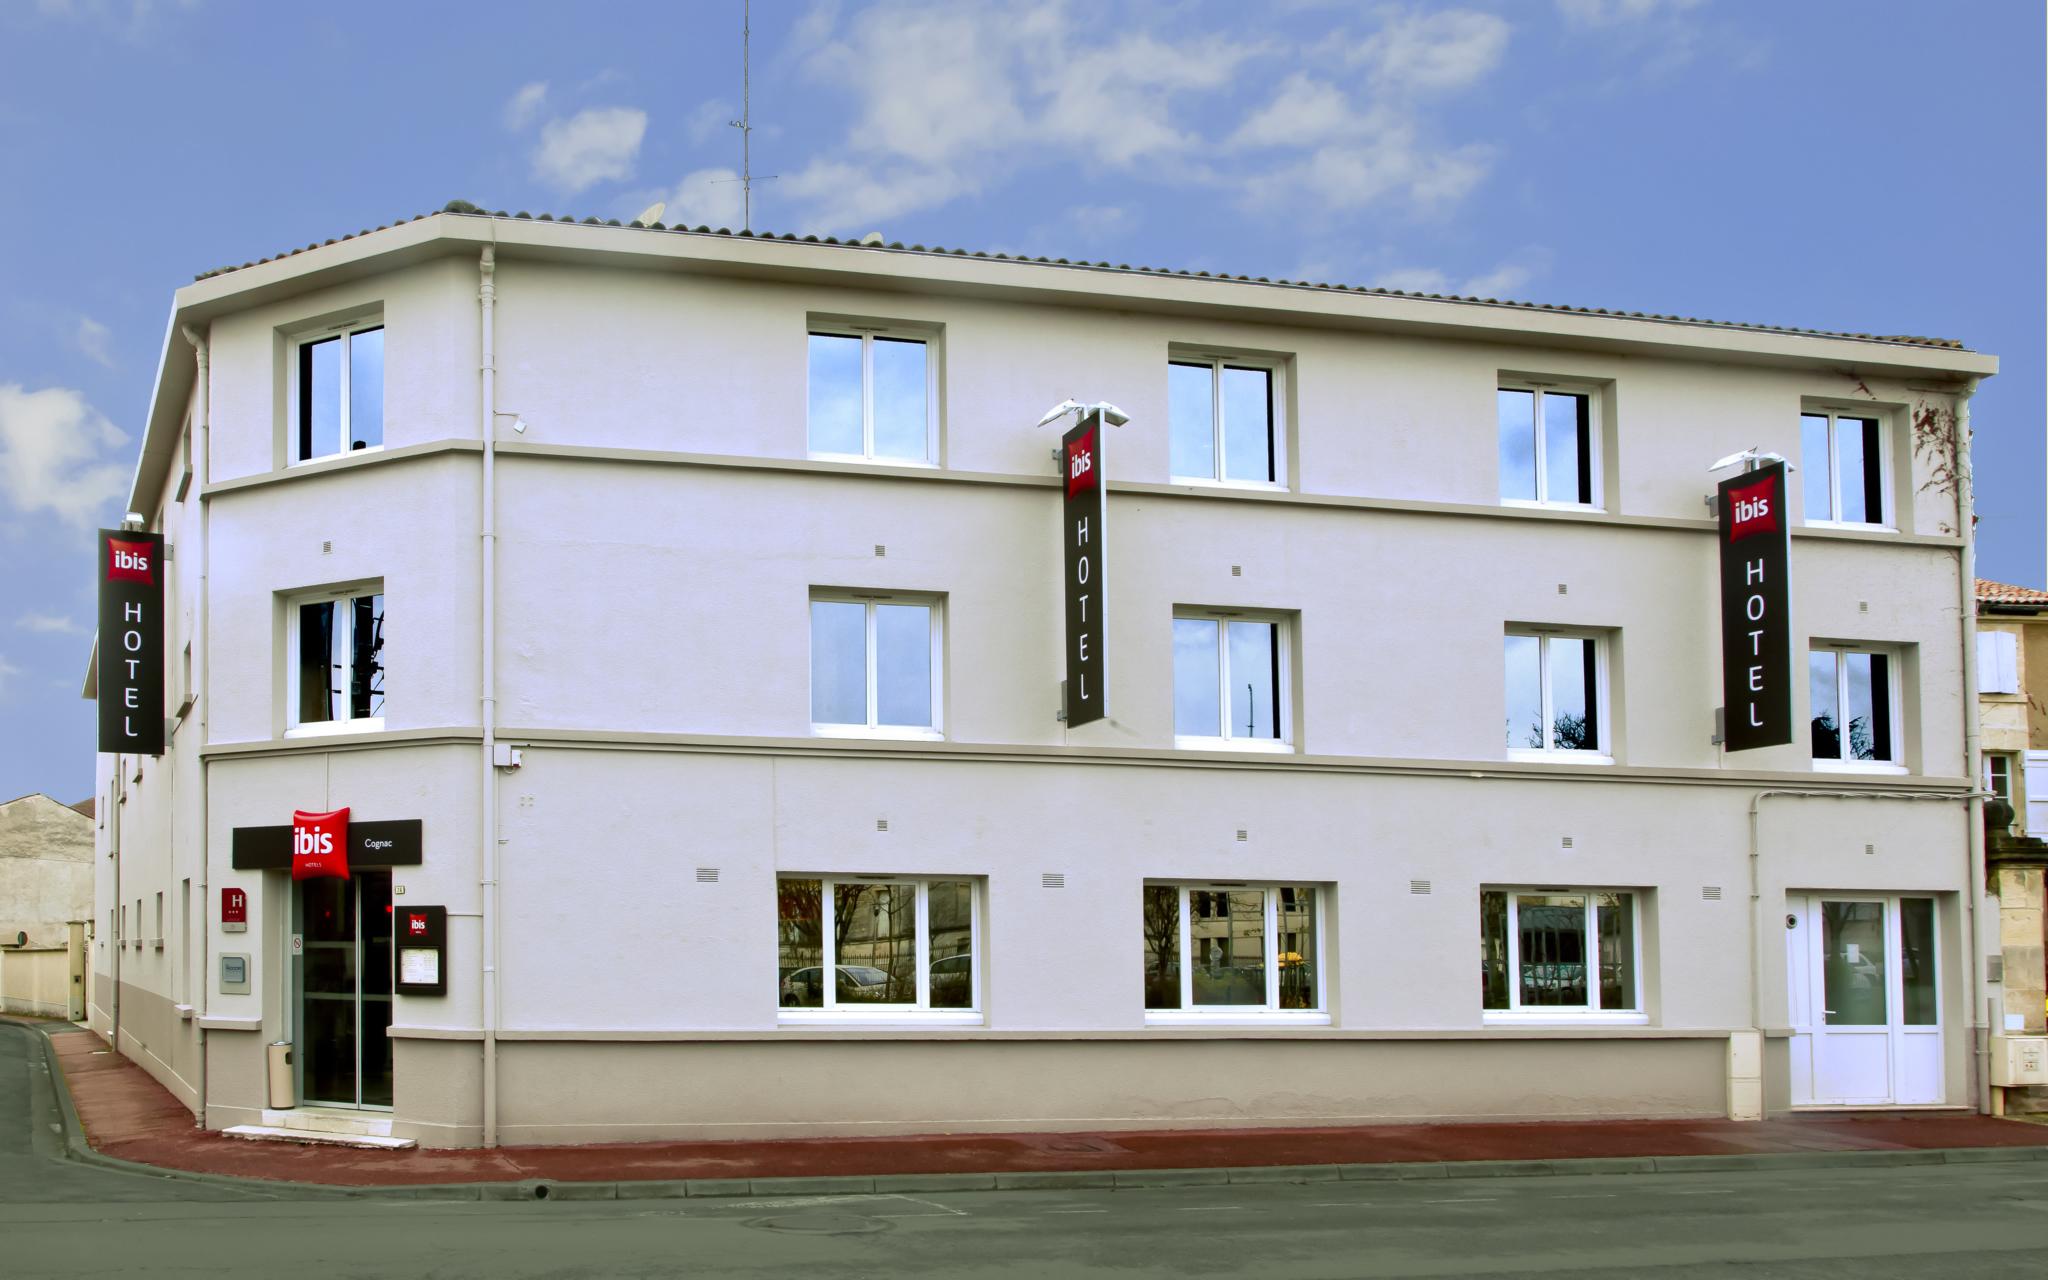 H tel ibis cognac h tel destination cognac for Cognac hotel